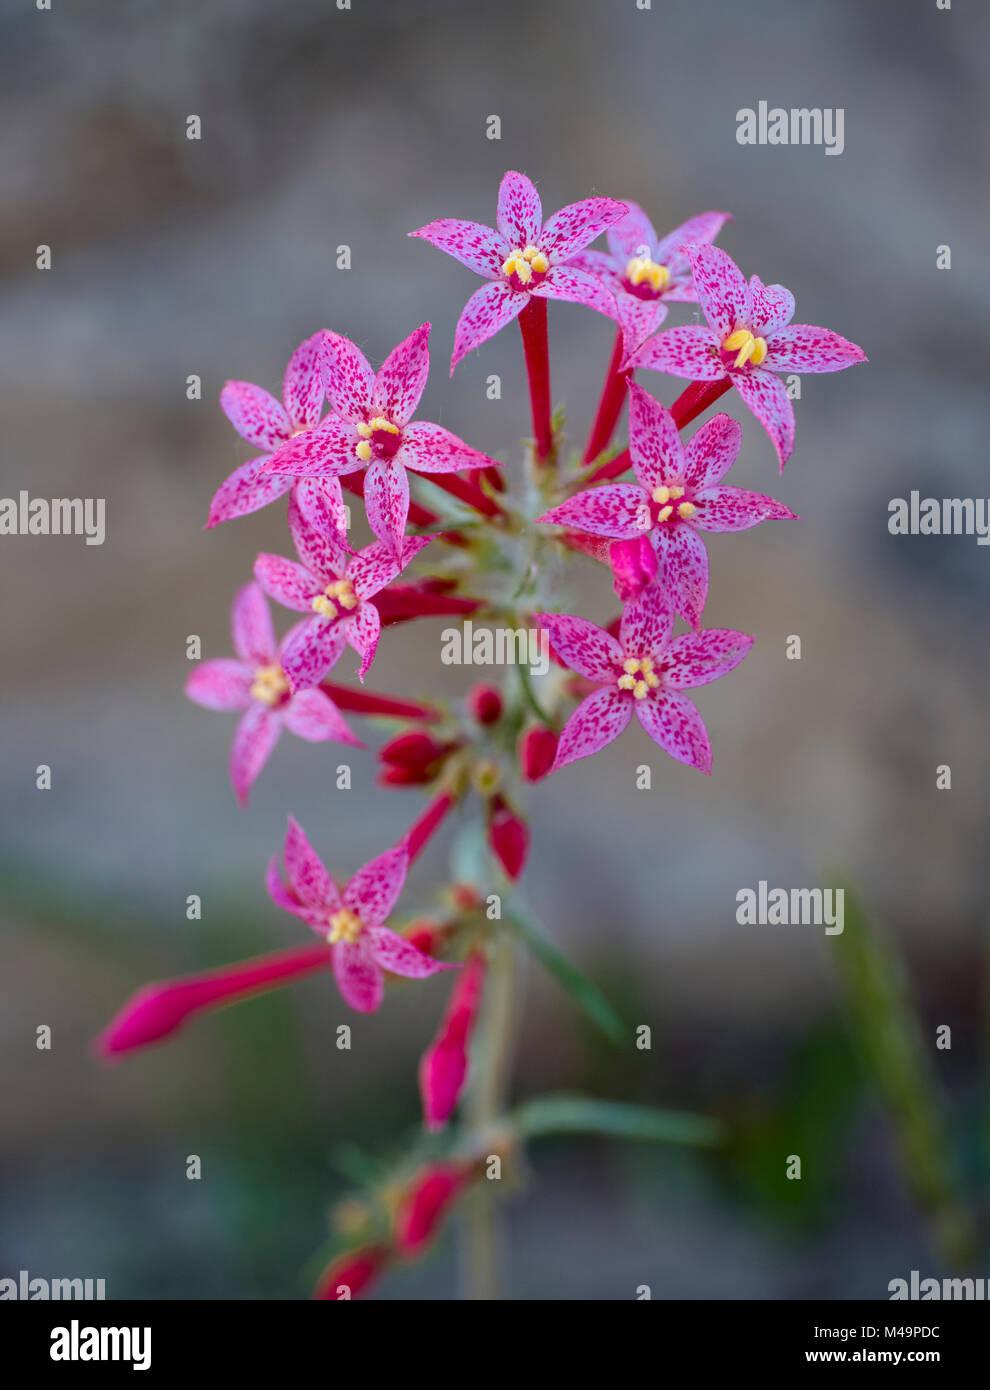 Scarlet Gilia - Stock Image